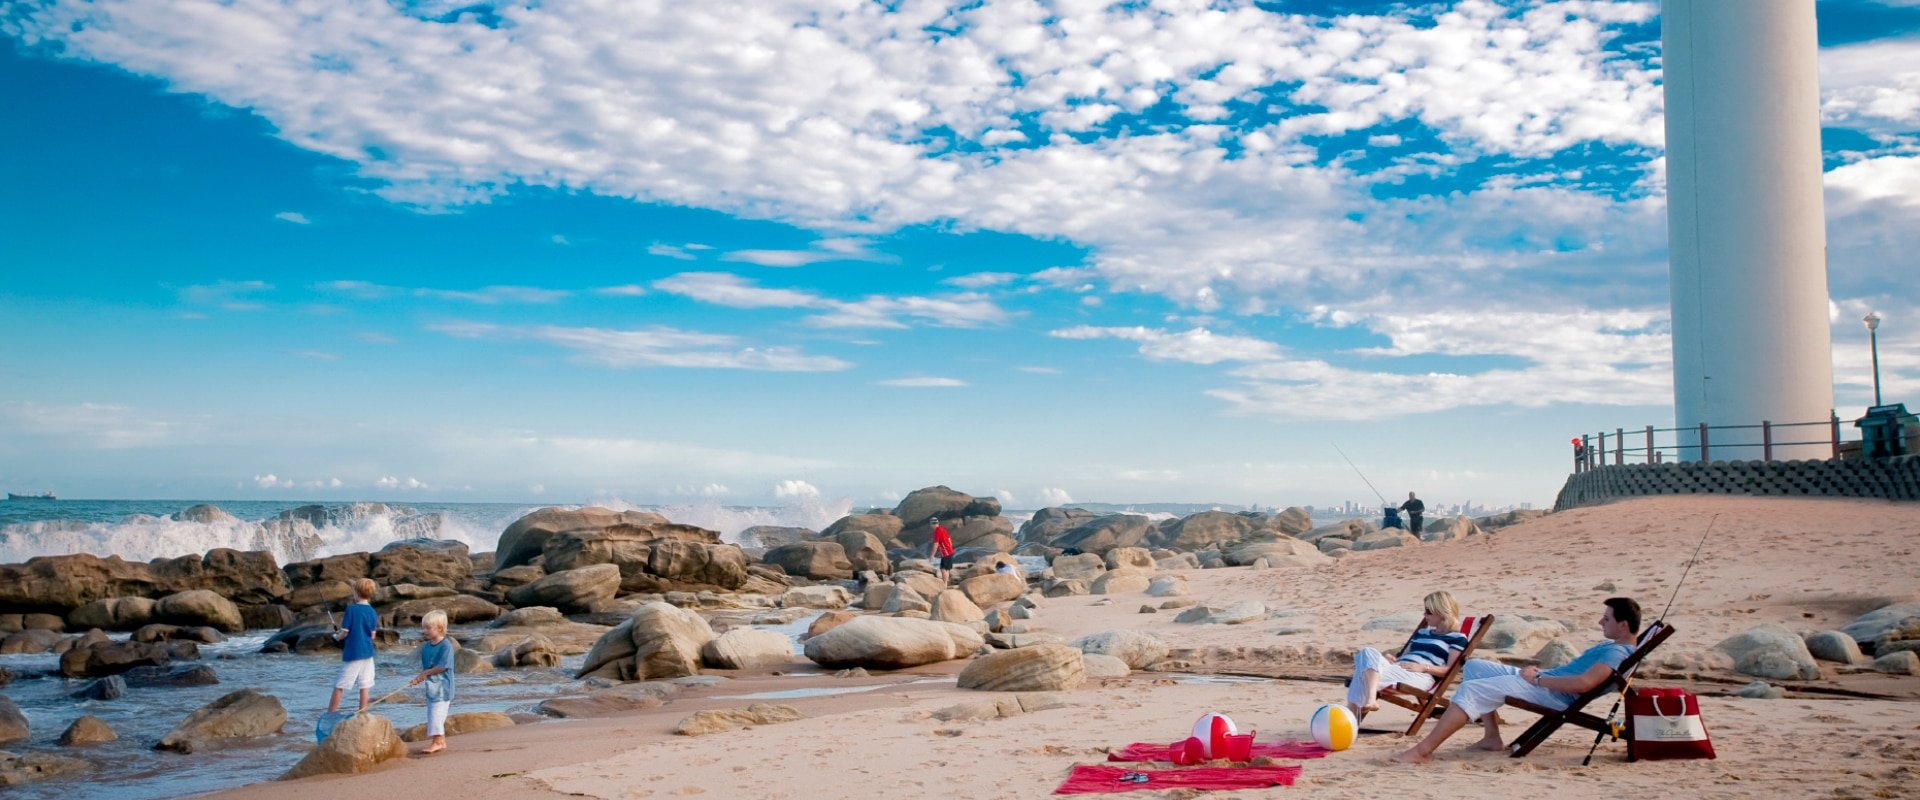 Be adventurous on the beach